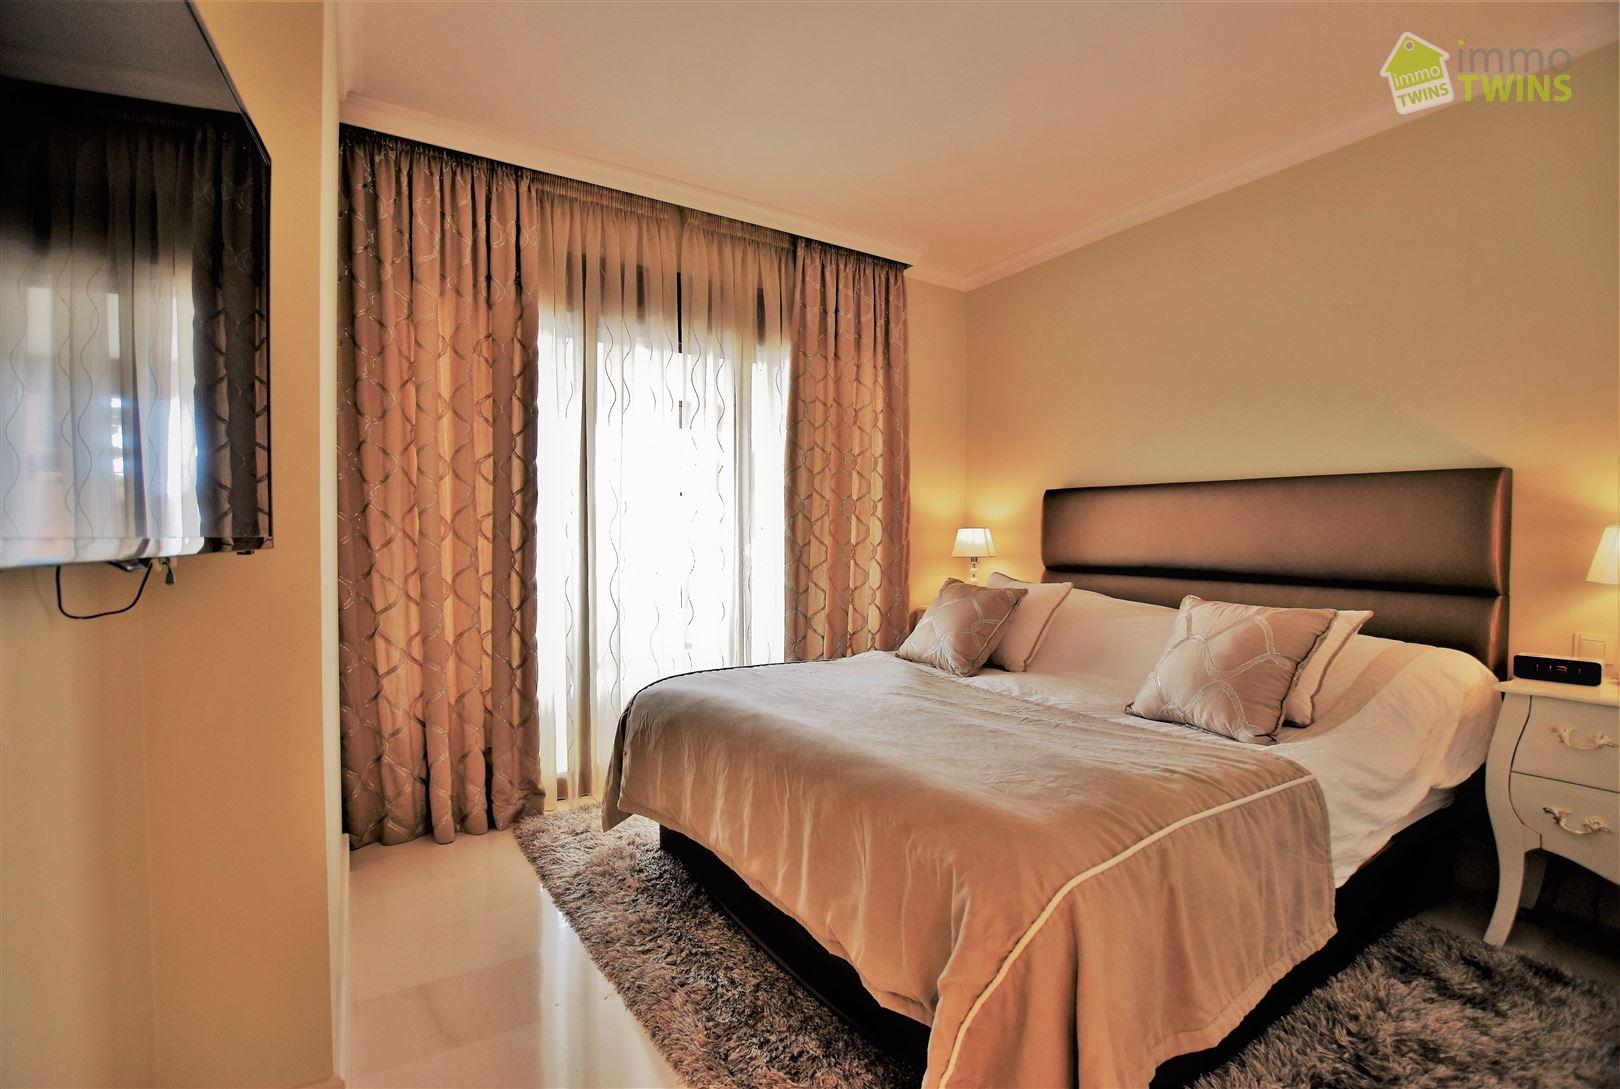 Foto 17 : Appartement te 29679 MARBELLA (Spanje) - Prijs € 485.000